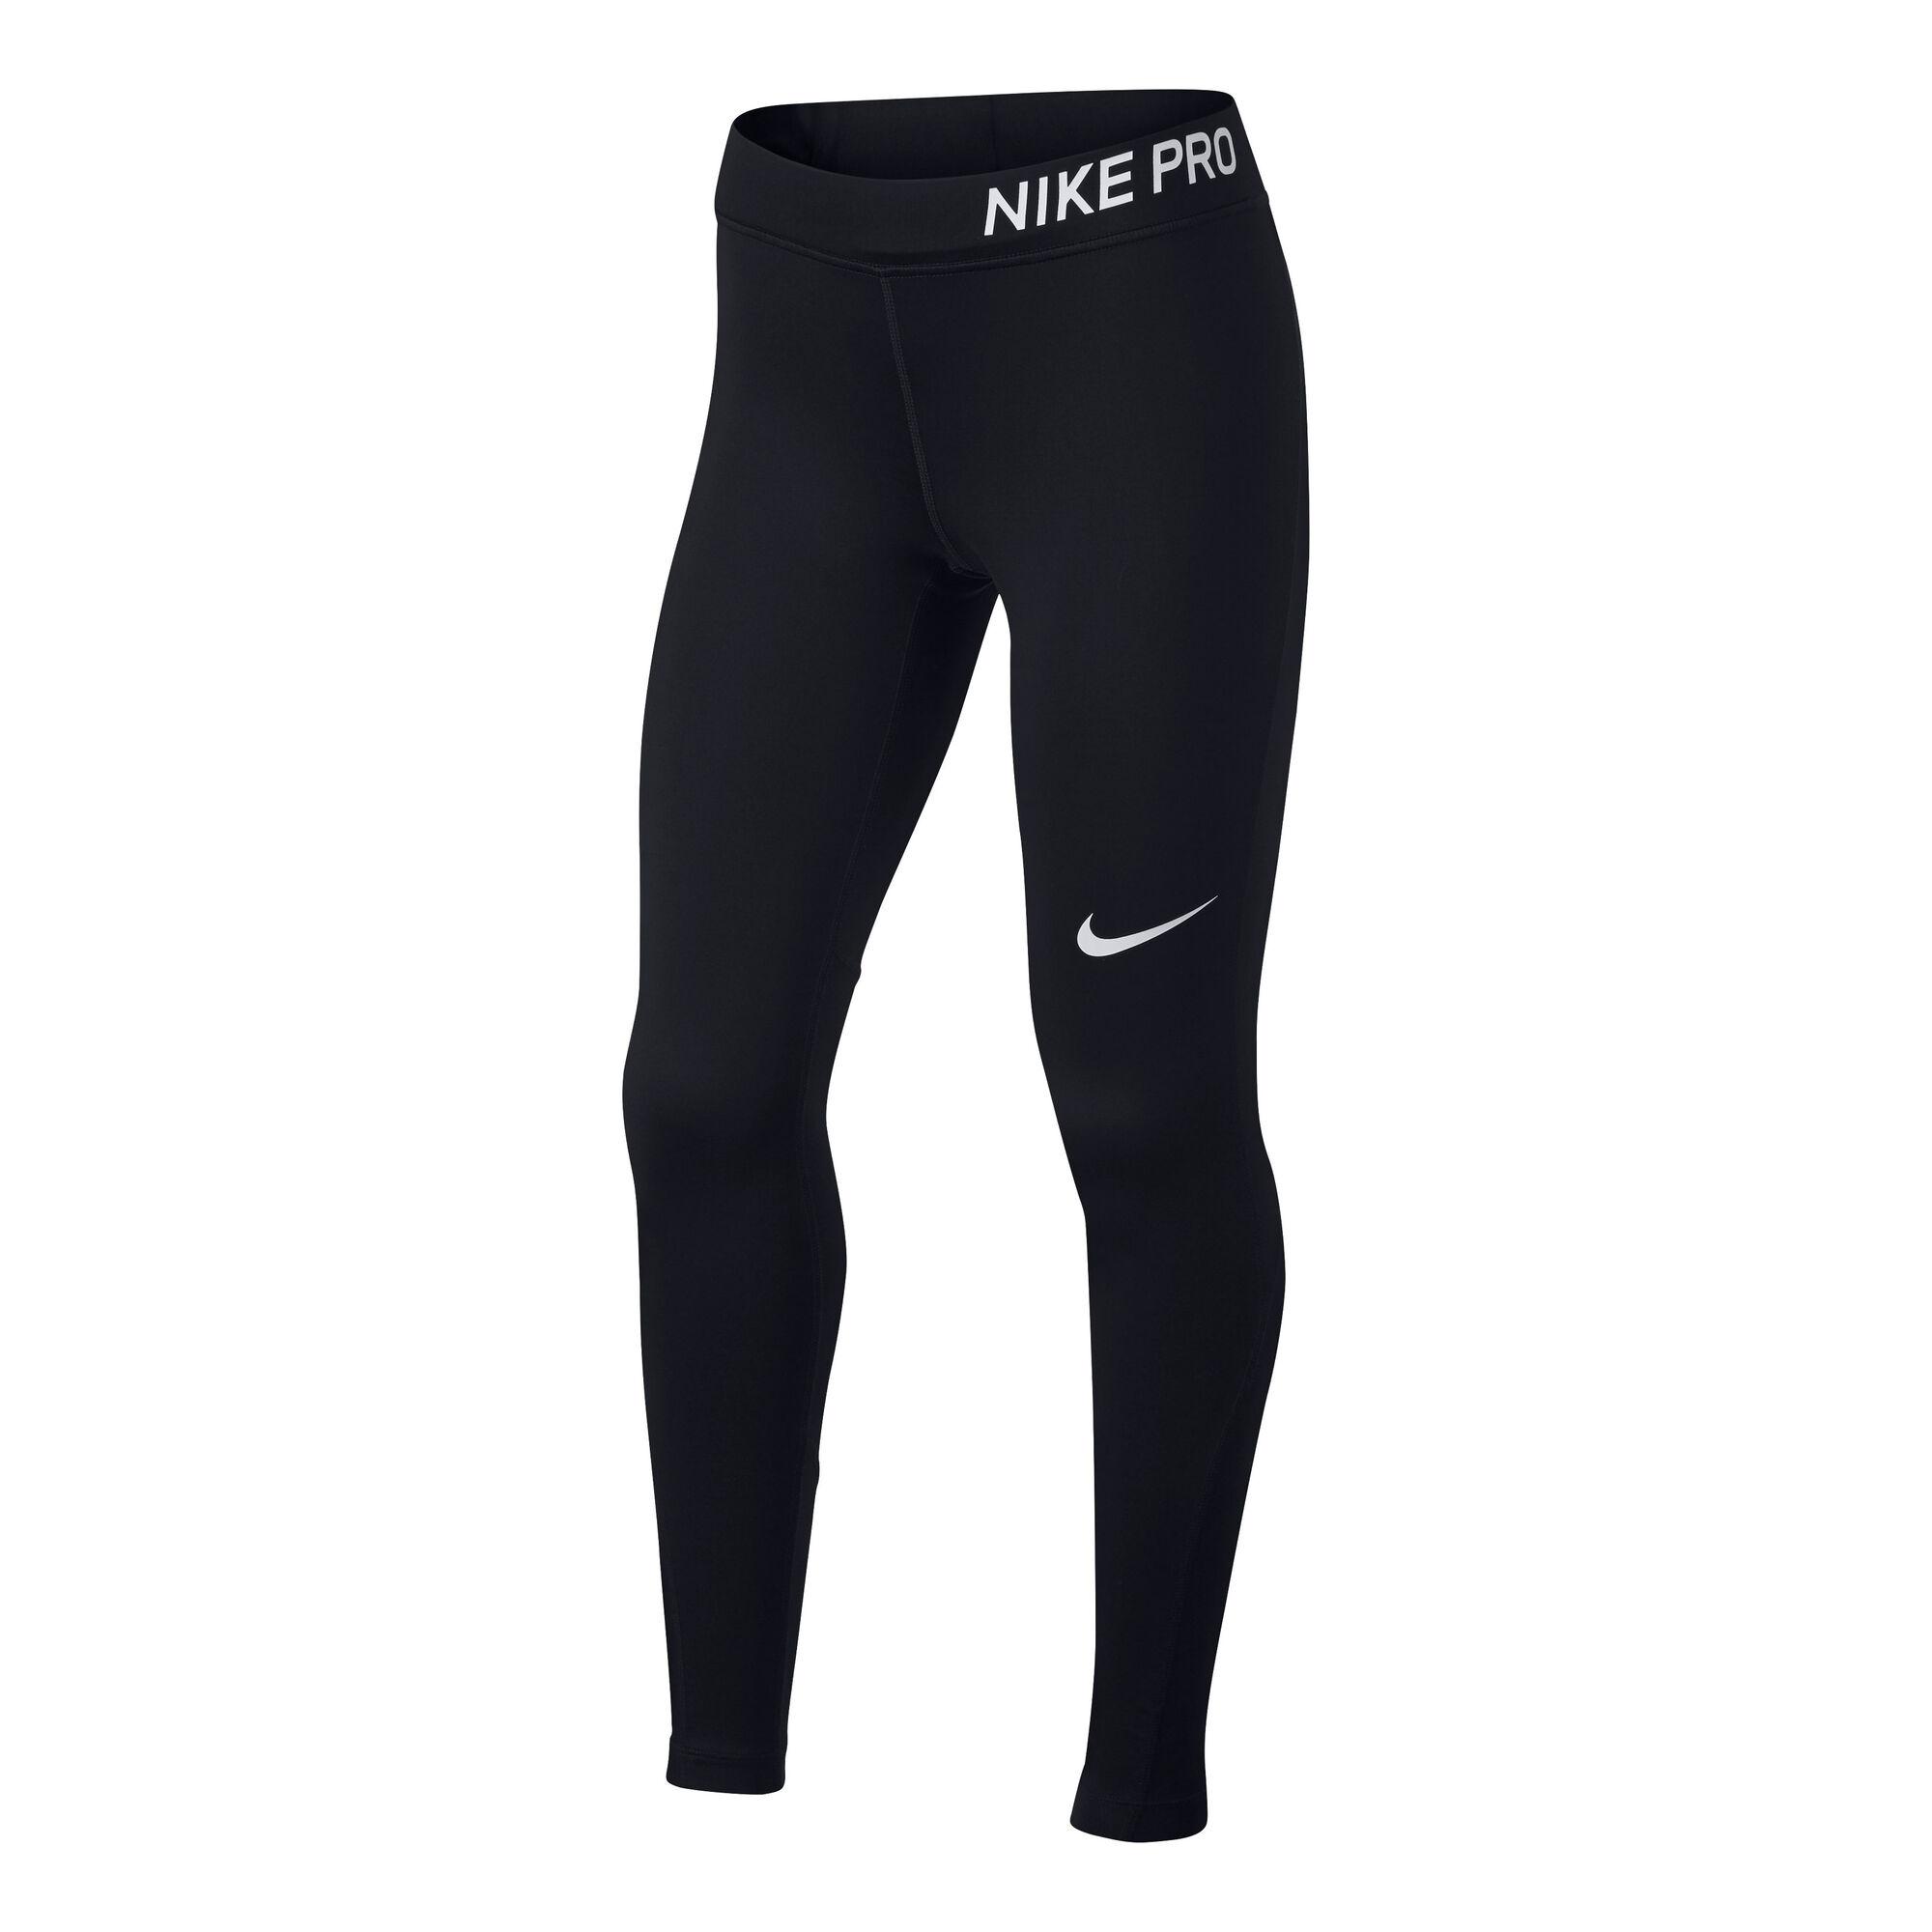 e77ccf657d Nike Pro Calzamaglia Ragazze - Nero, Bianco compra online | Tennis-Point